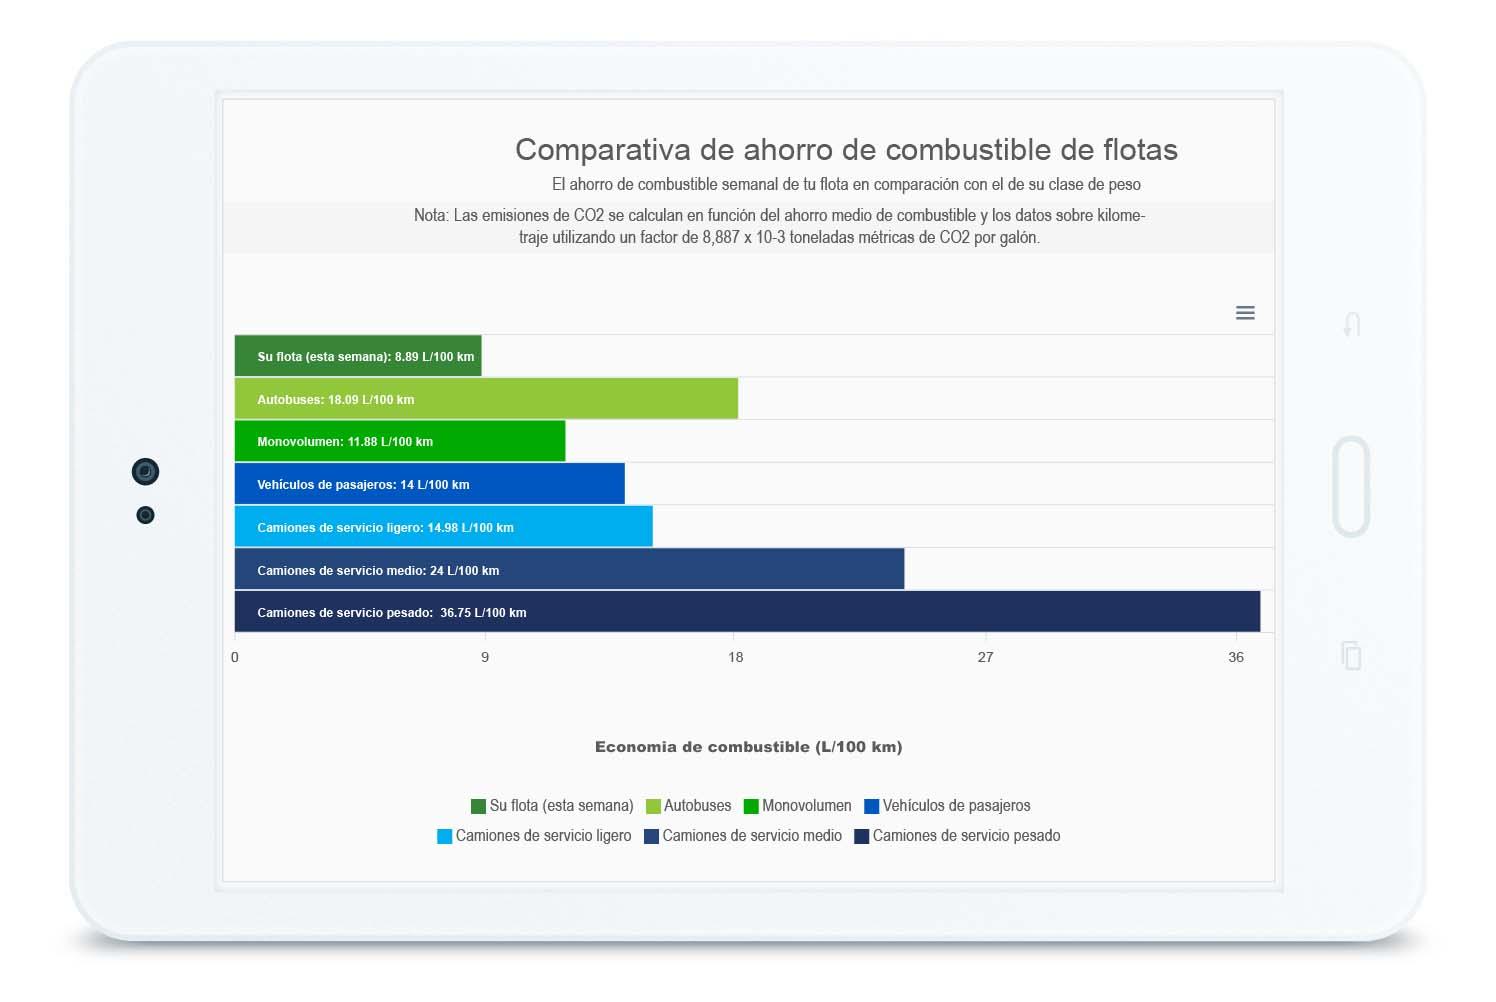 Tabla comparativa de ahorro de combustible de flota en tableta